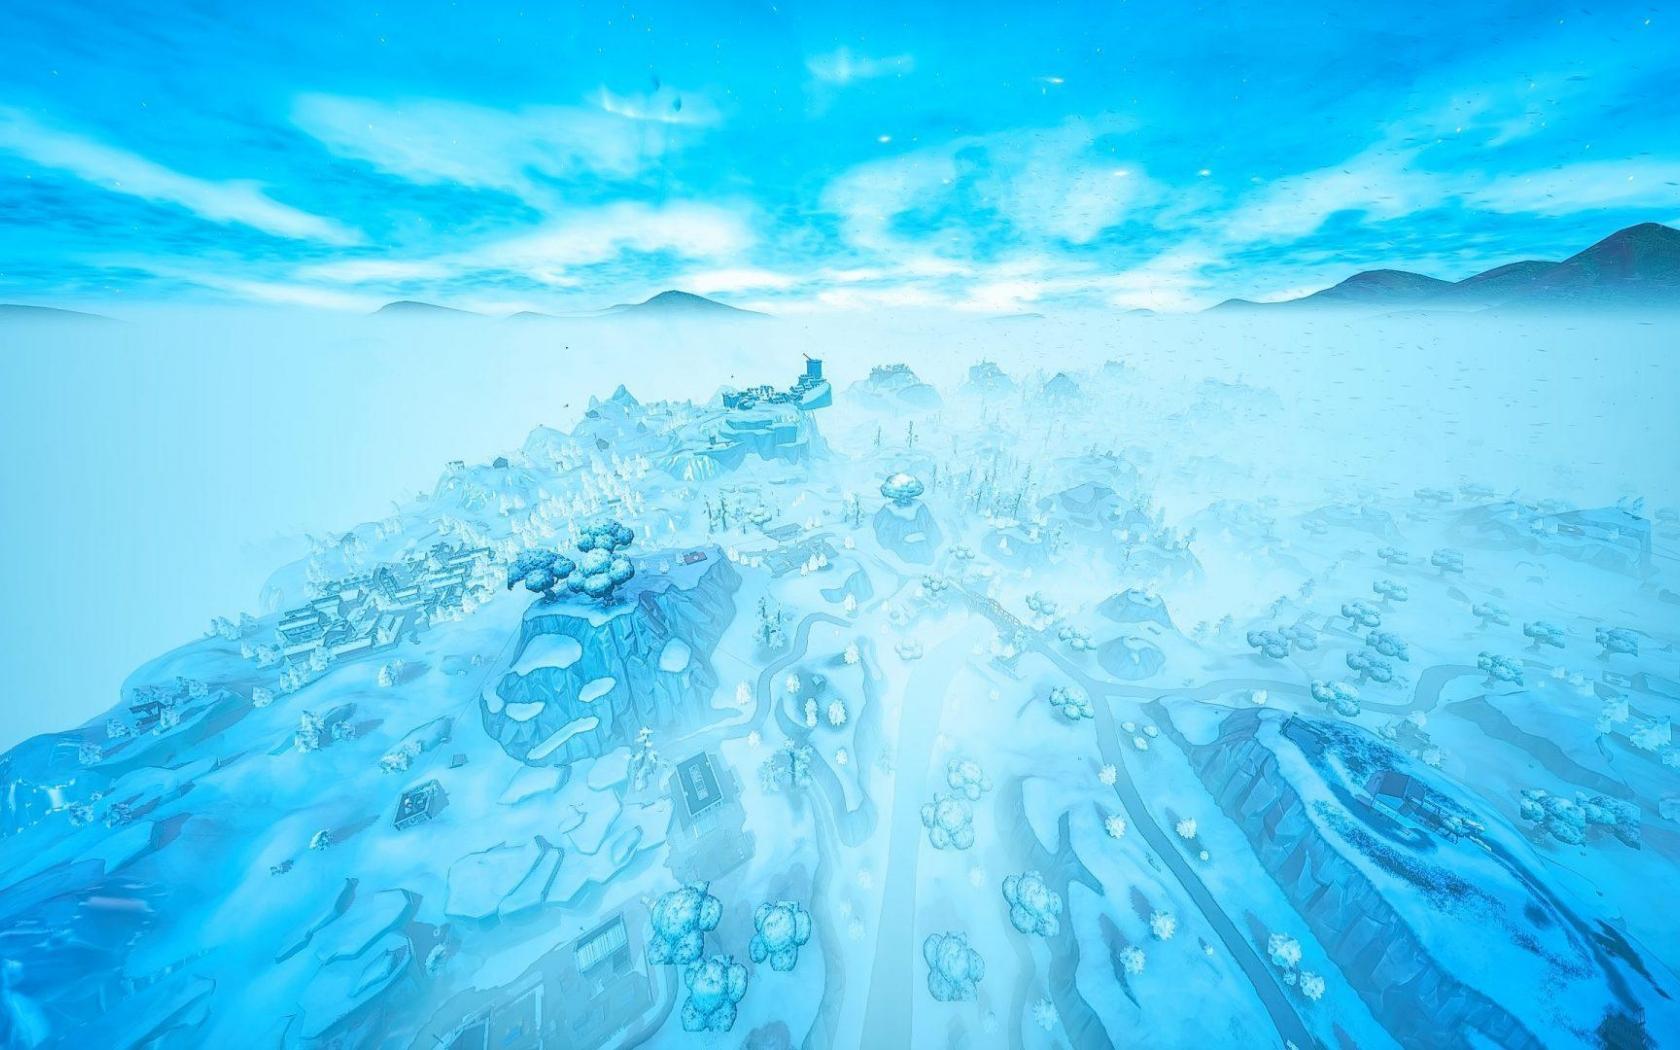 Fortnite Ice King Wallpaper Hd Fortnite Skins Youtube Fortnite Event Ice King 2956596 Hd Wallpaper Backgrounds Download